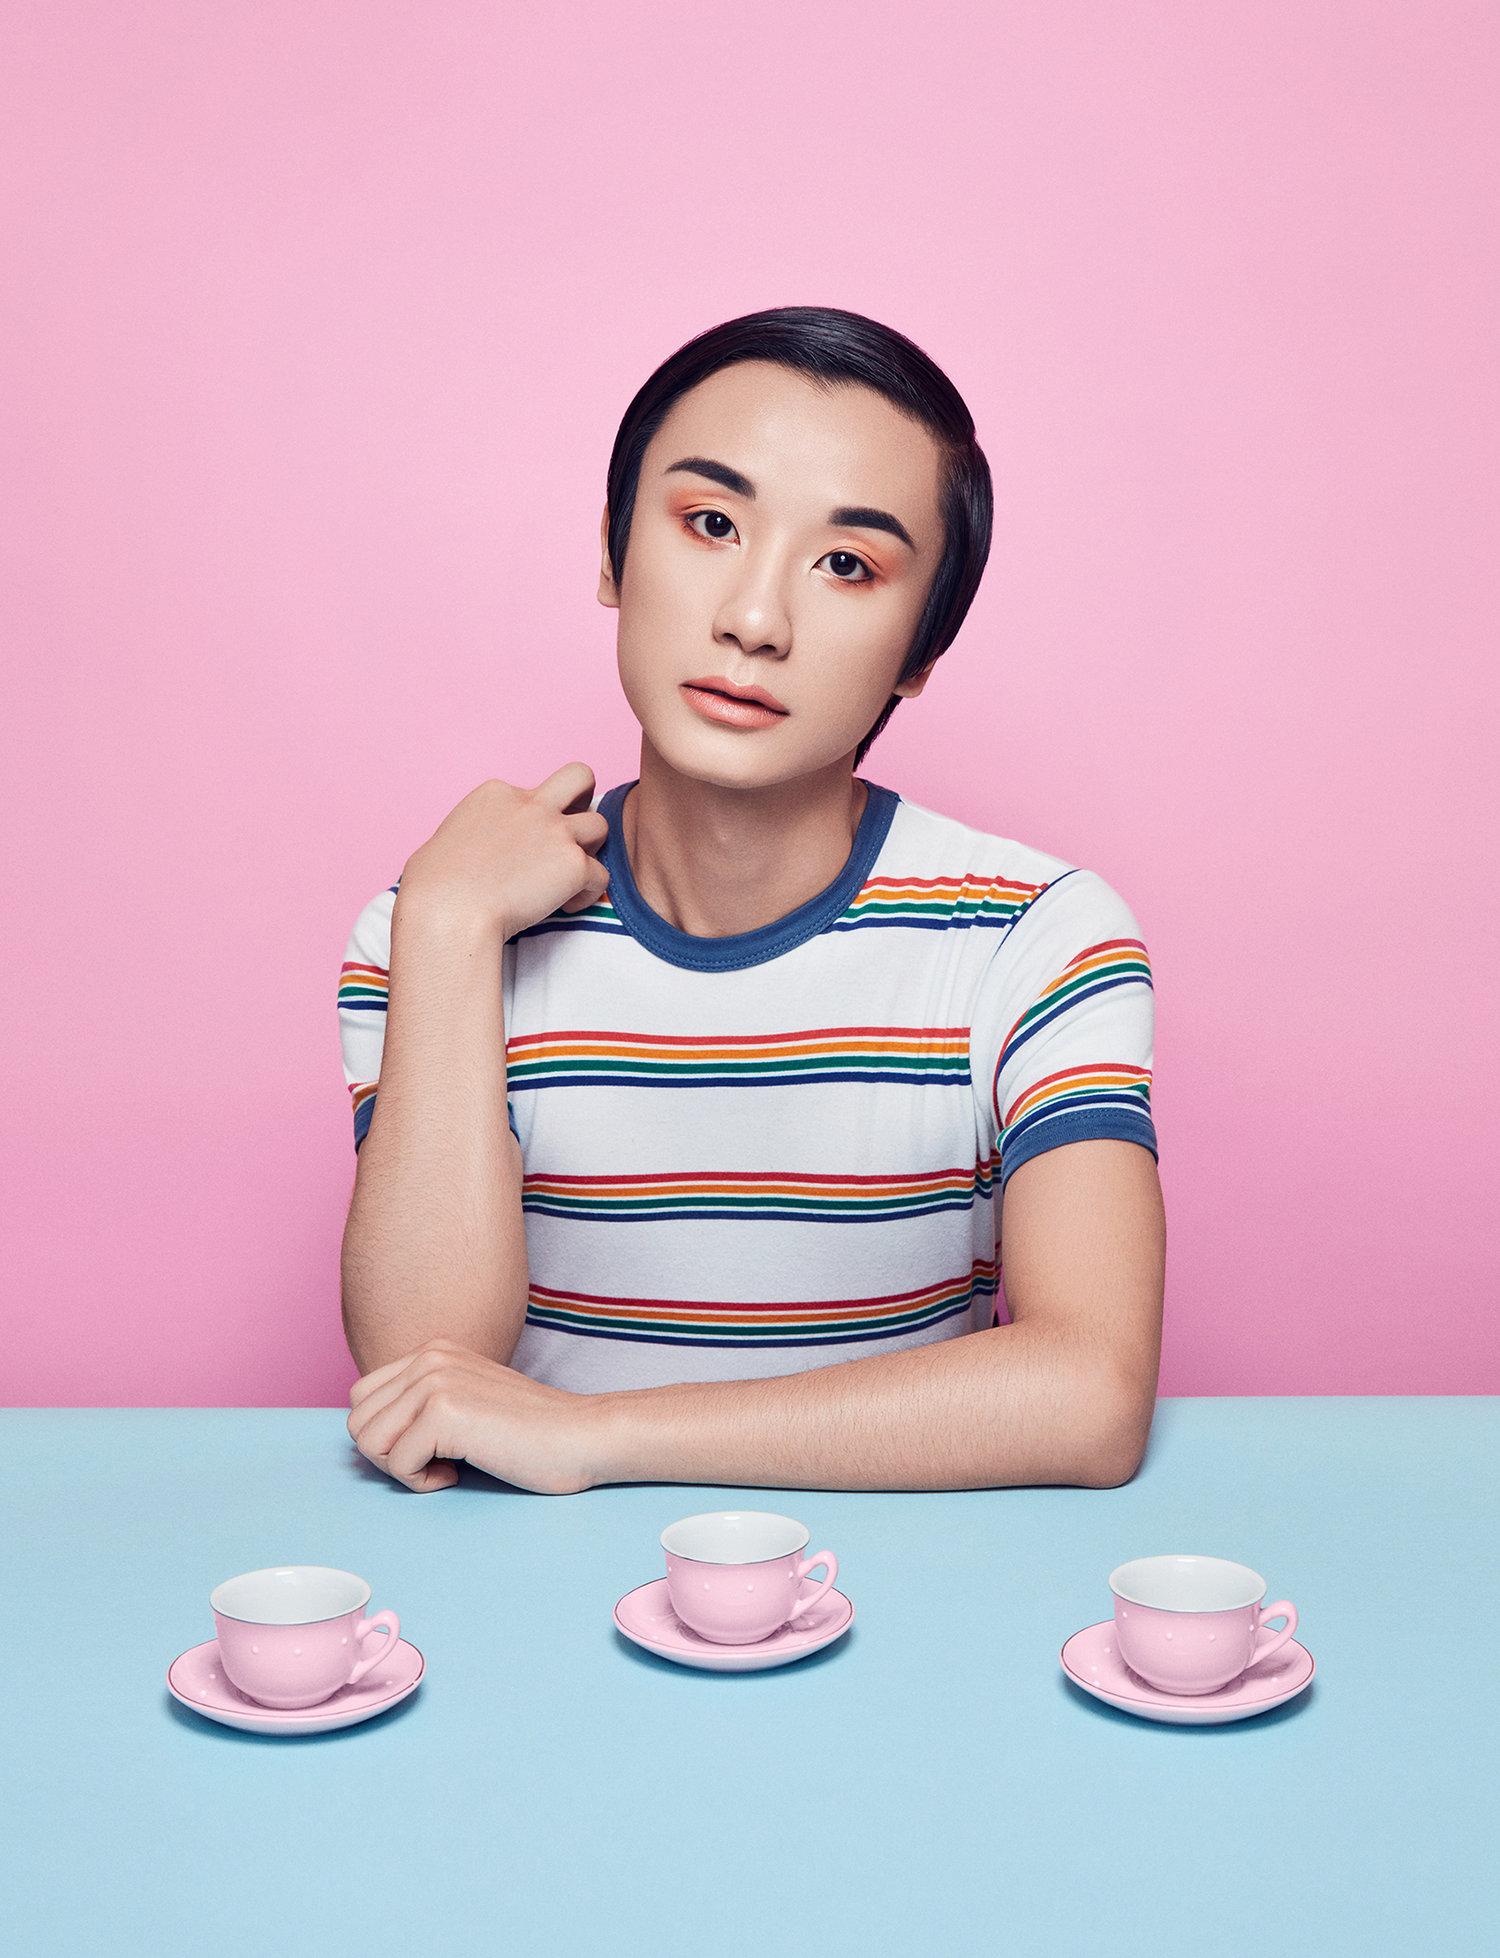 LGBTQ vlogger Flawless Kevin